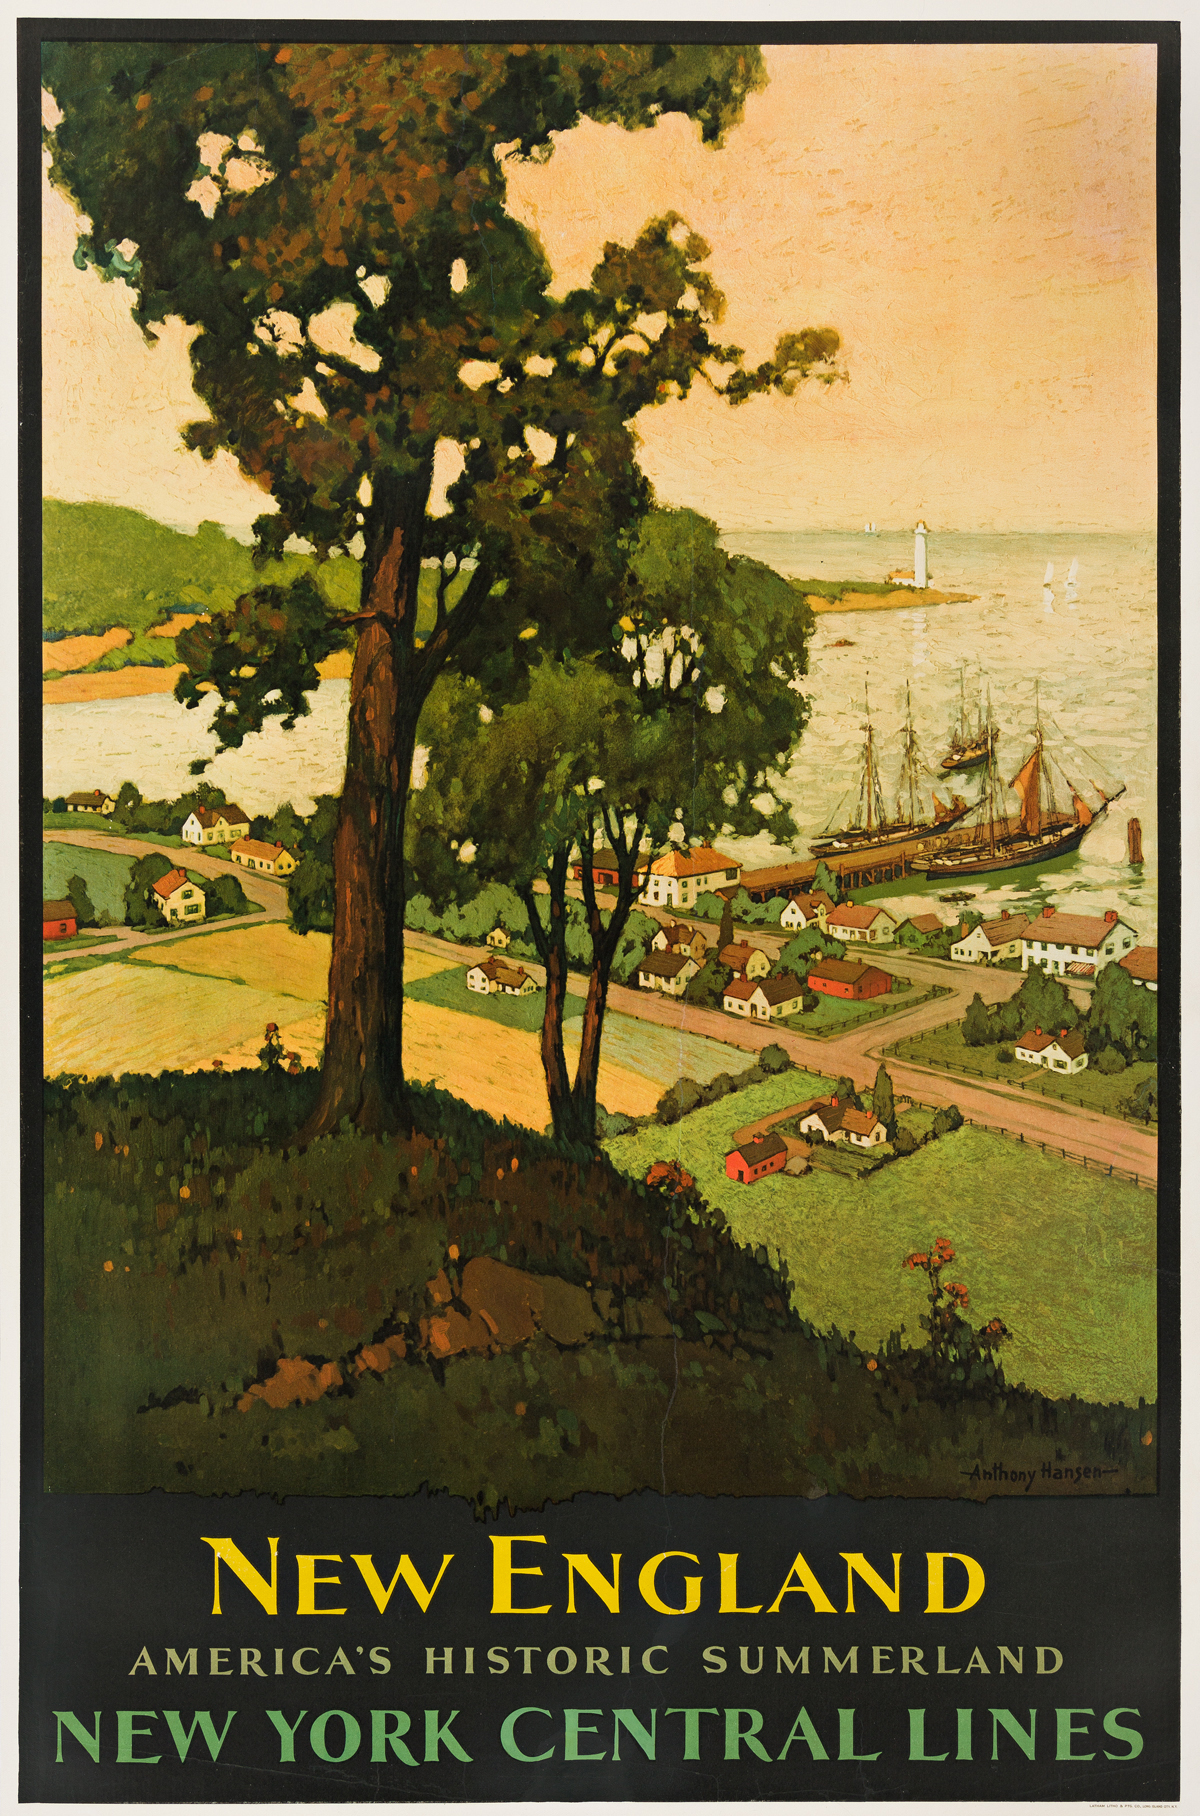 Anthony Hansen (Dates Unknown).  NEW ENGLAND / AMERICAS HISTORIC SUMMERLAND. Circa 1930s.